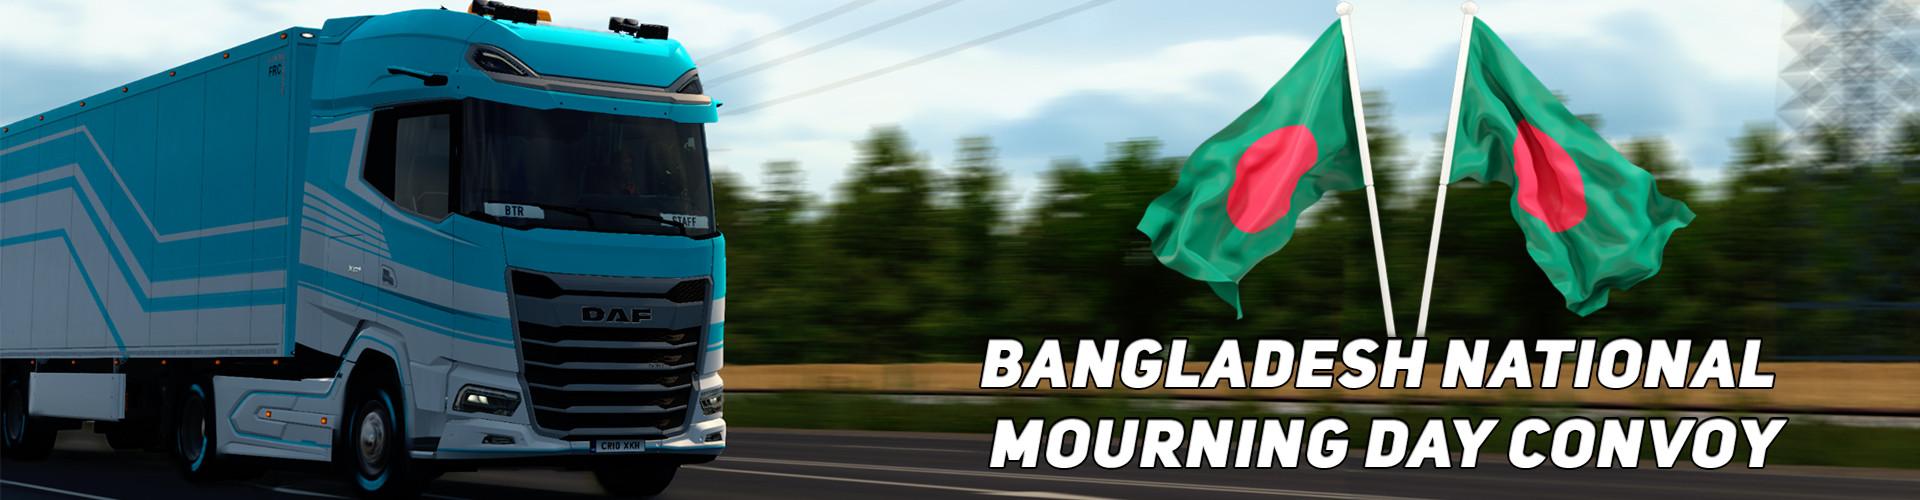 Bangladesh National Mourning Day Convoy